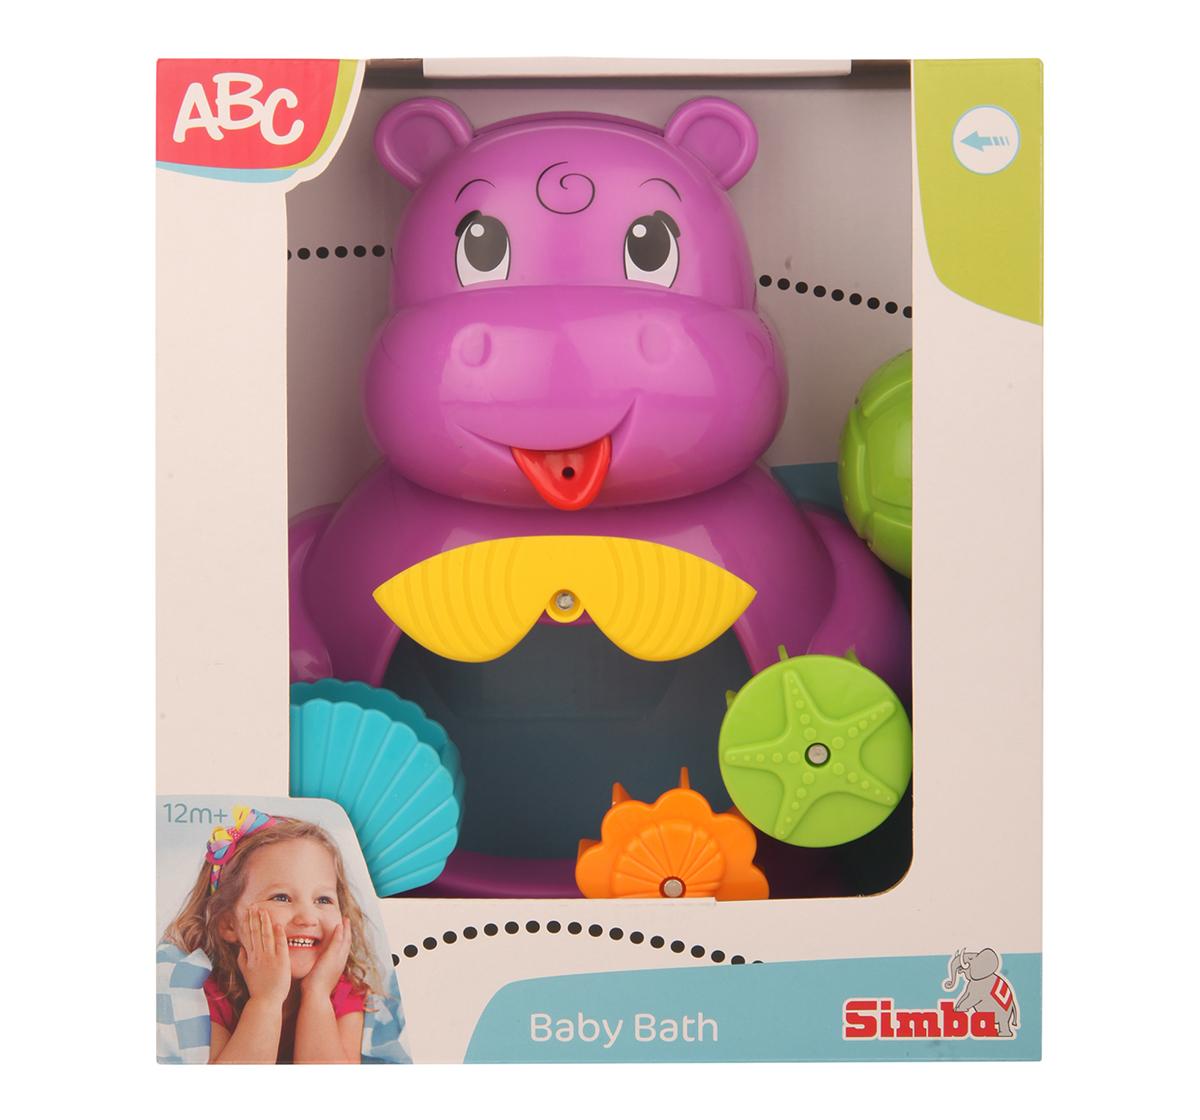 Simba | Simba Abc Bath Hippo, Unisex, 12M+ (Pink)